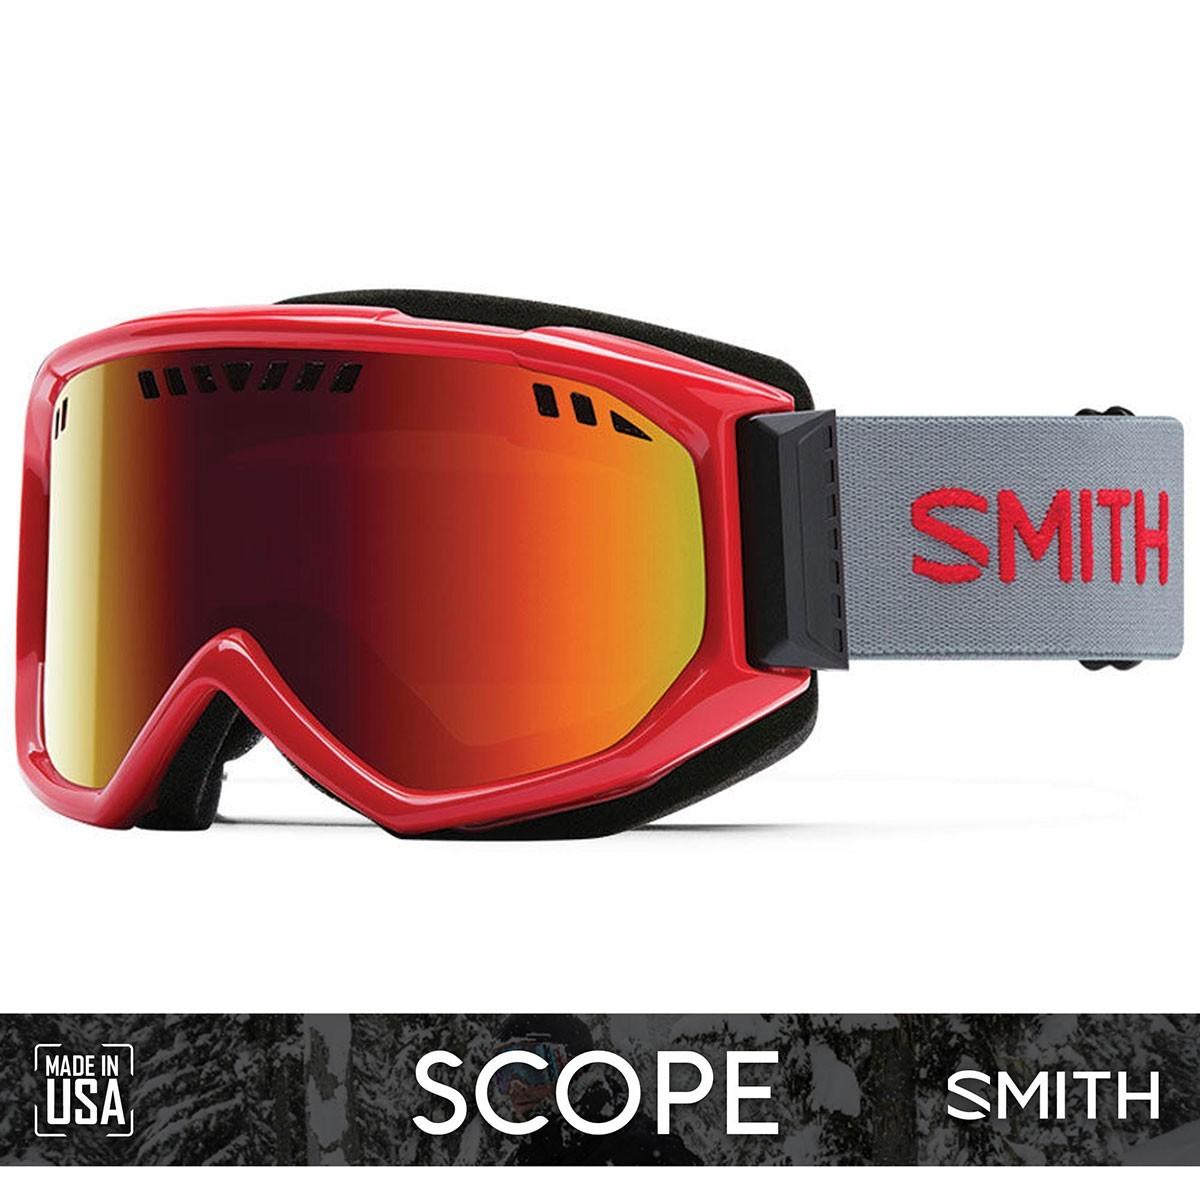 SMITH SCOPE Fire | S3 RED SOL-X Mirror - Изображение - AQUAMATRIX